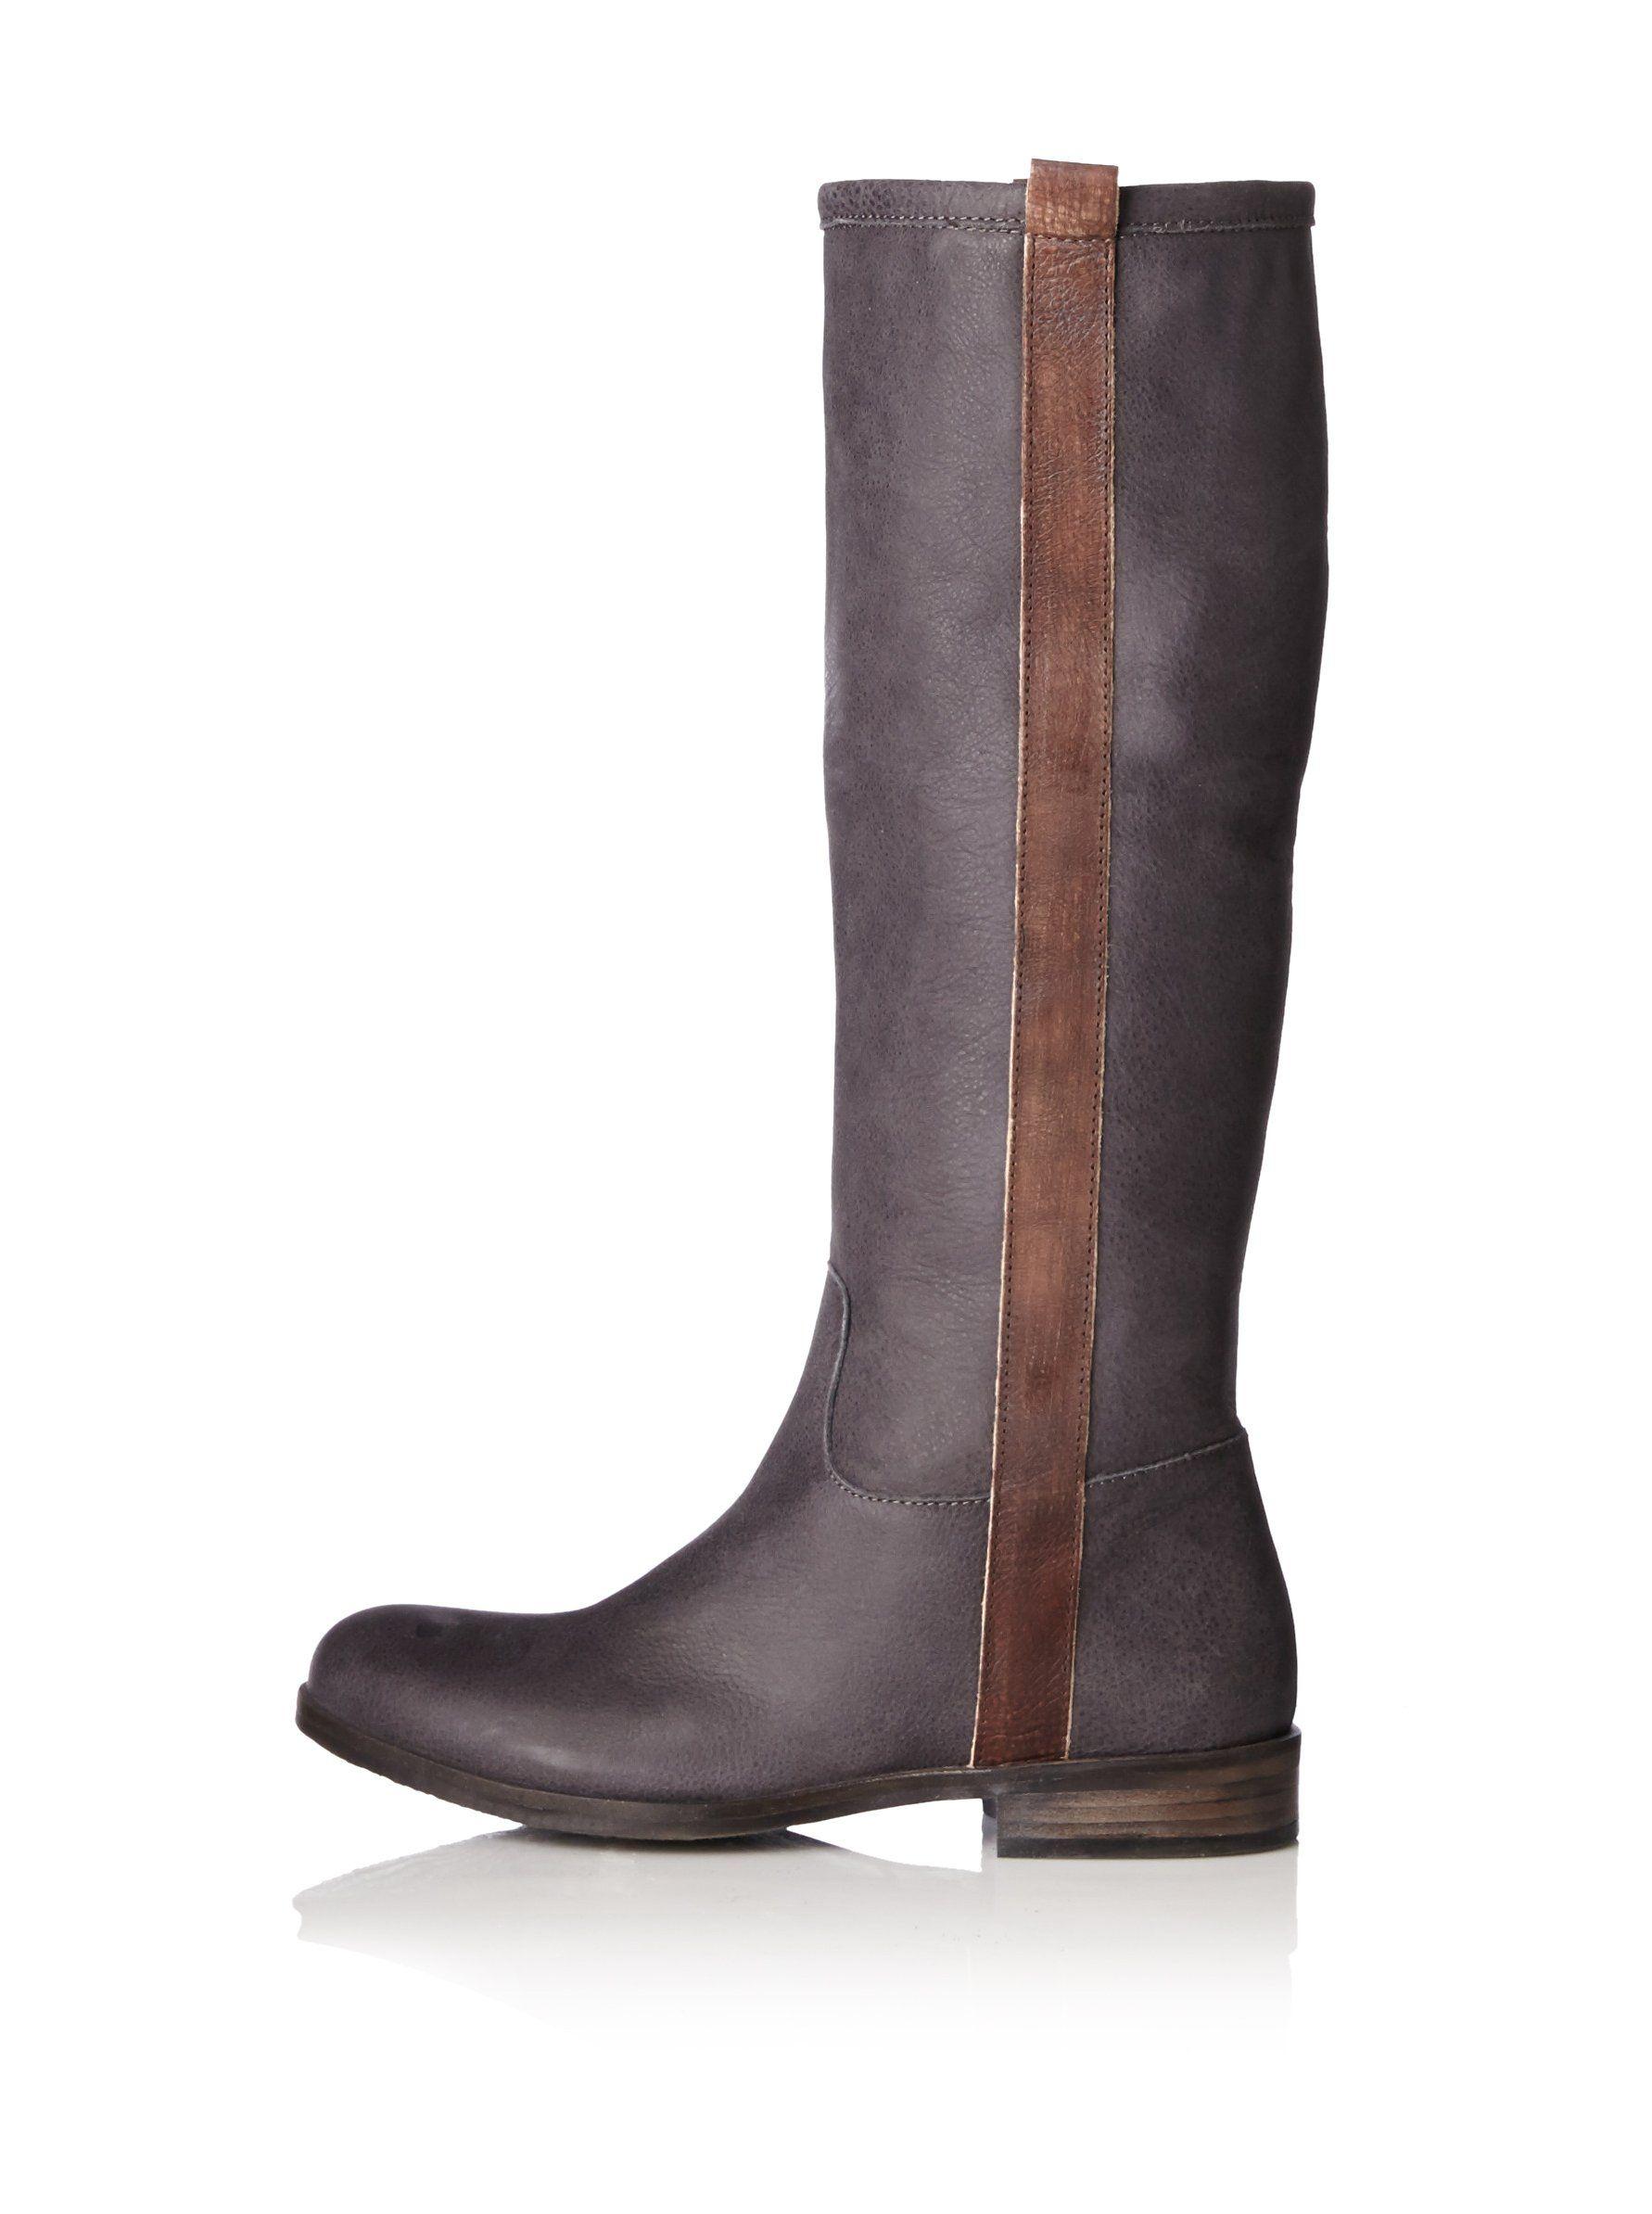 Cordani Women's Pippa Boot at MYHABIT